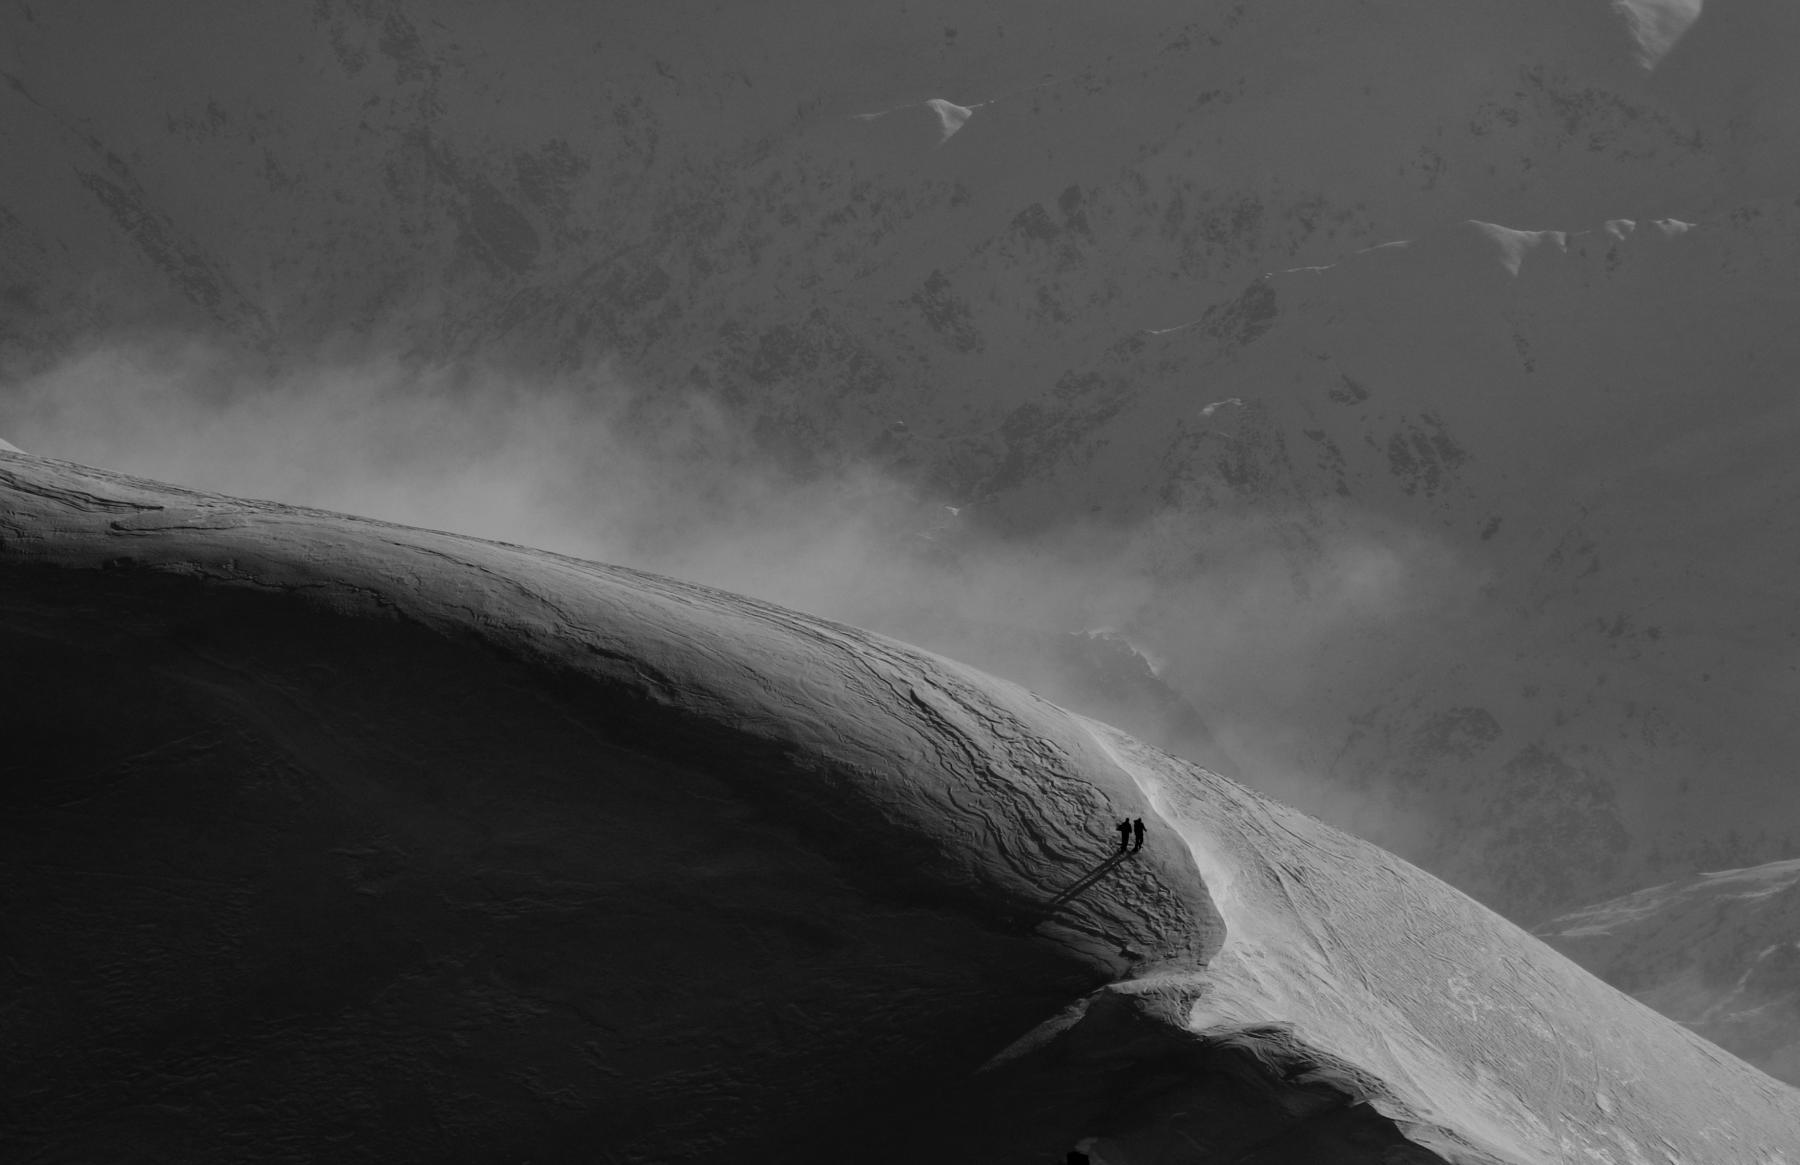 Tempesta (Punta), Punta Sibolet, Monte Tibert dal Santuario San Magno, anello 2014-12-26